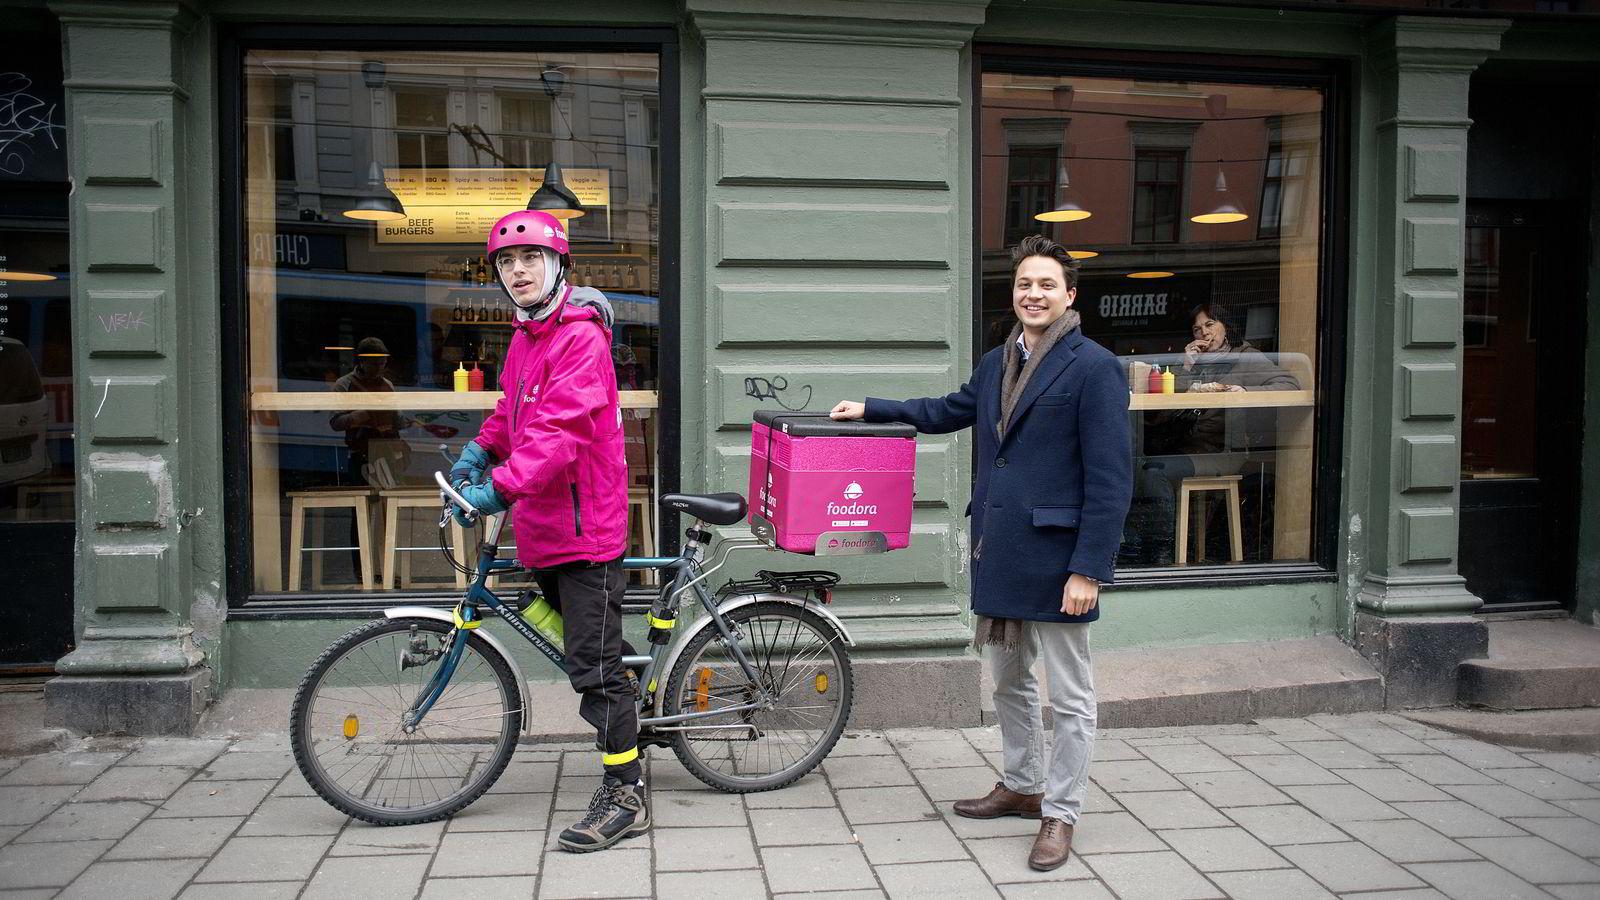 Syklist Emmanuel Fretelliere og norgessjef Carl Tengberg i Foodora.